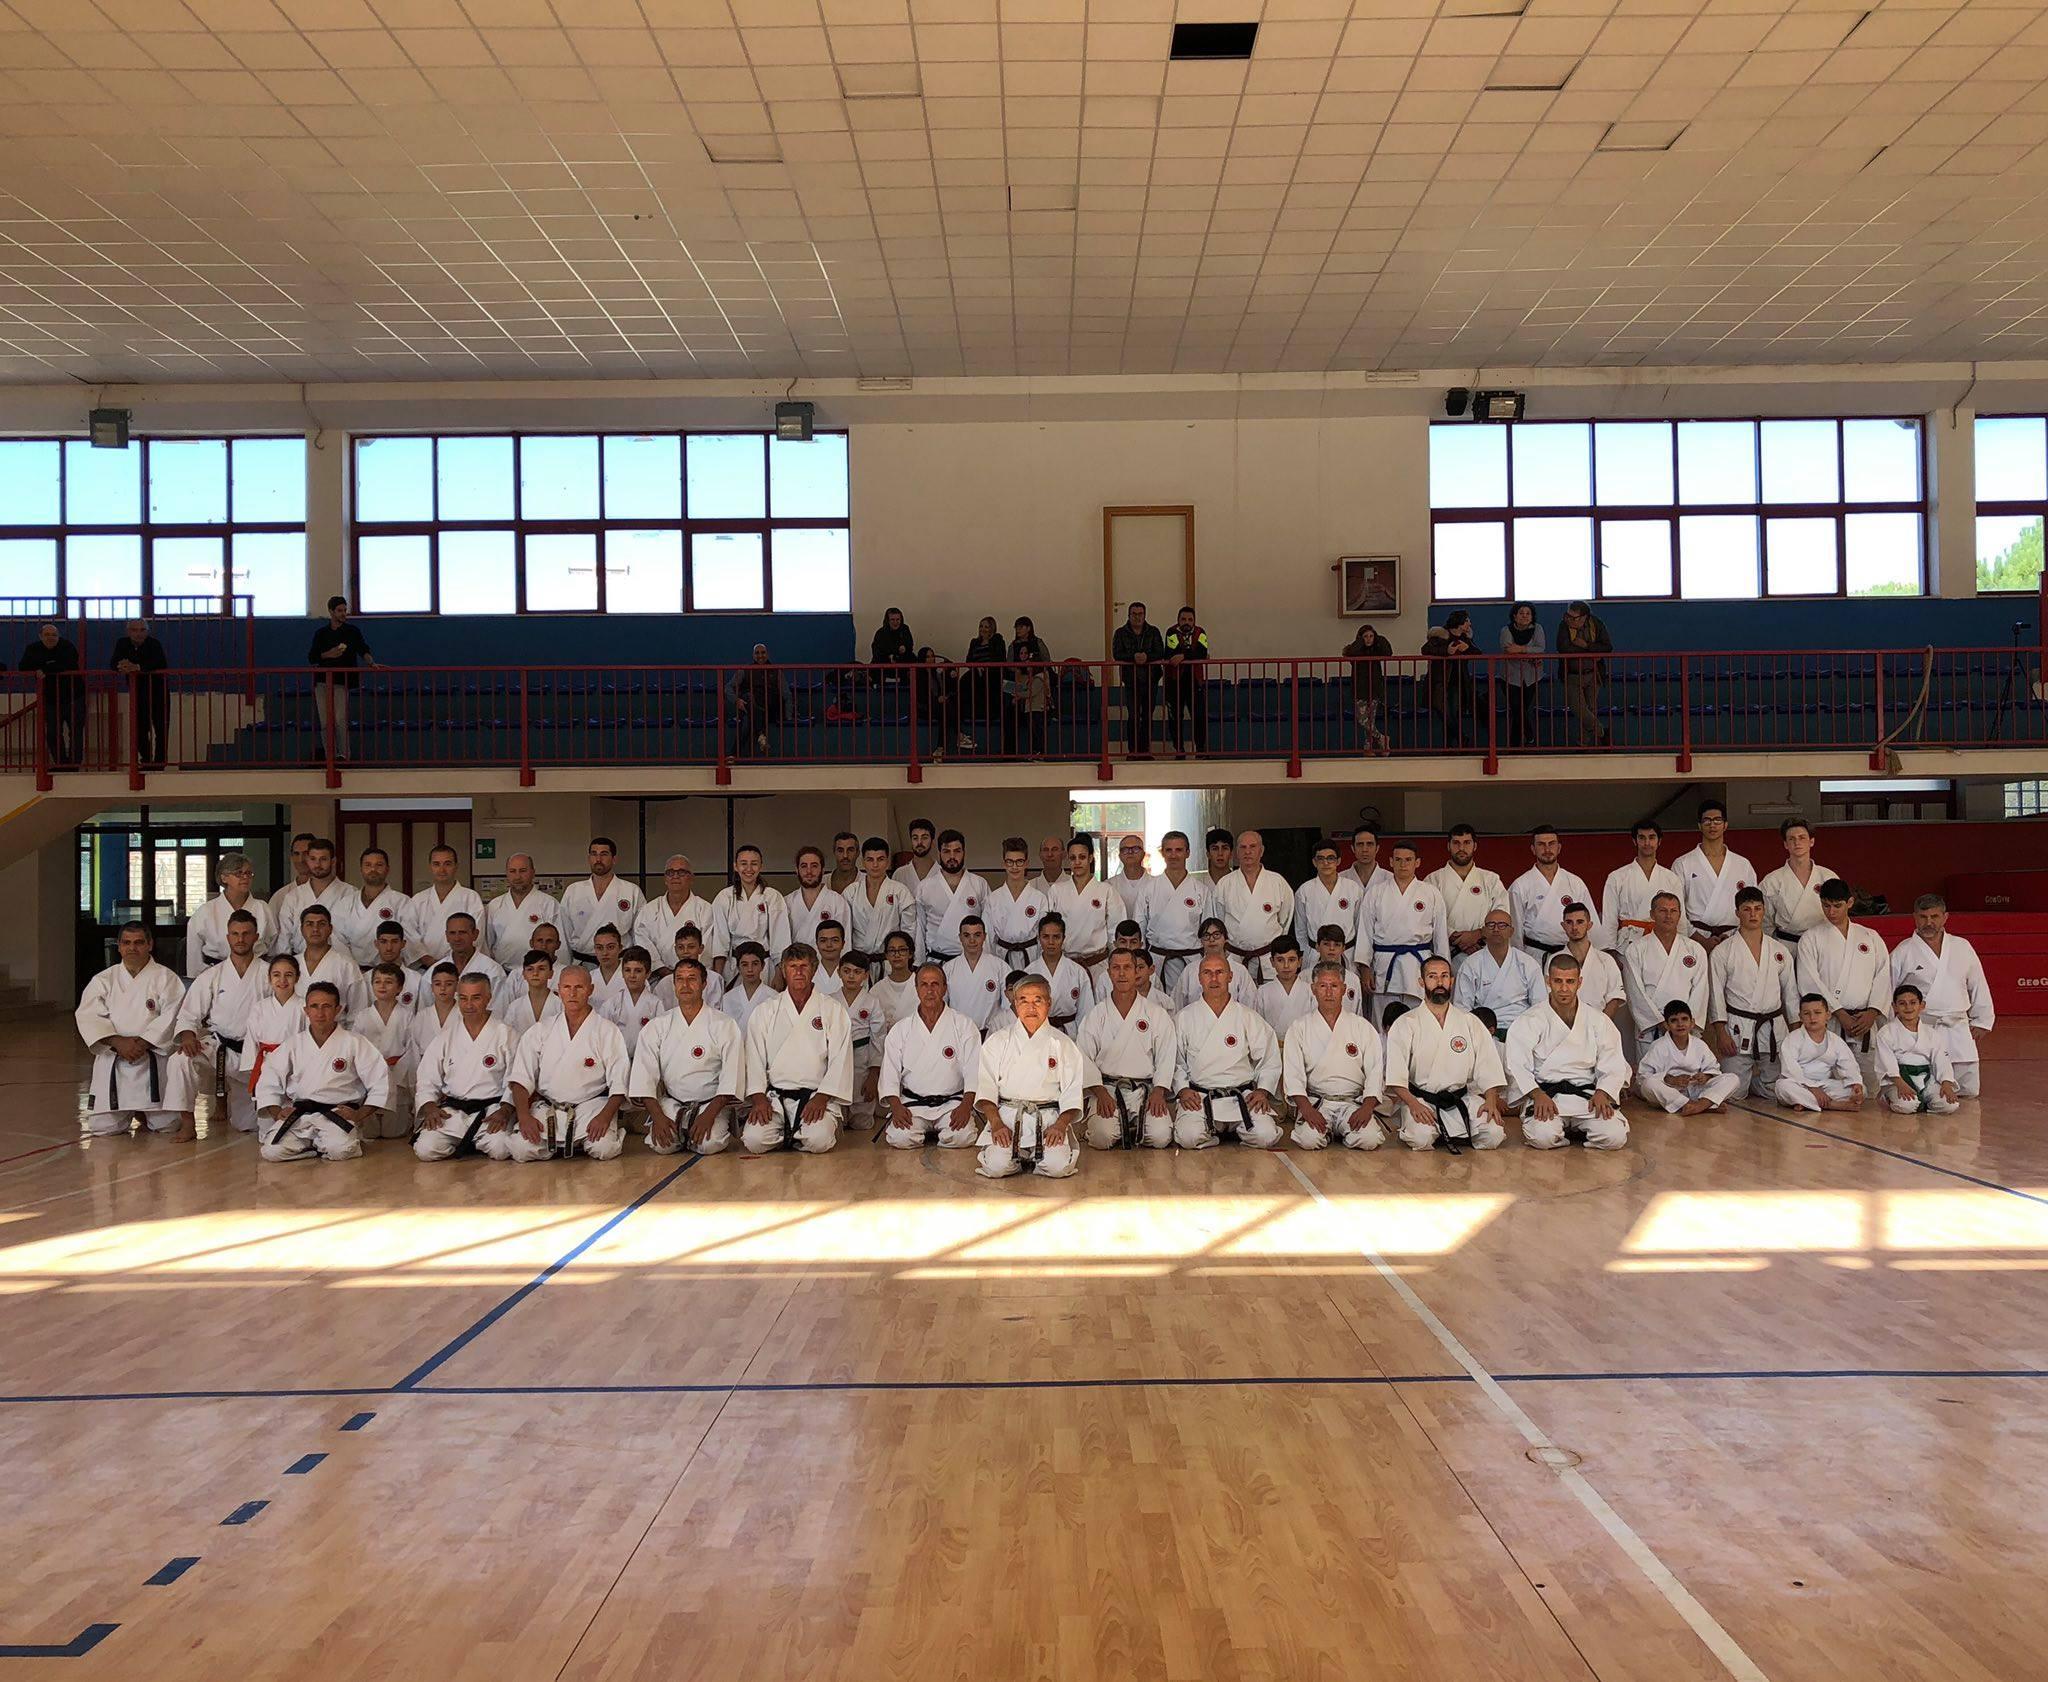 dks-Miura-Ispicanov2018-A8